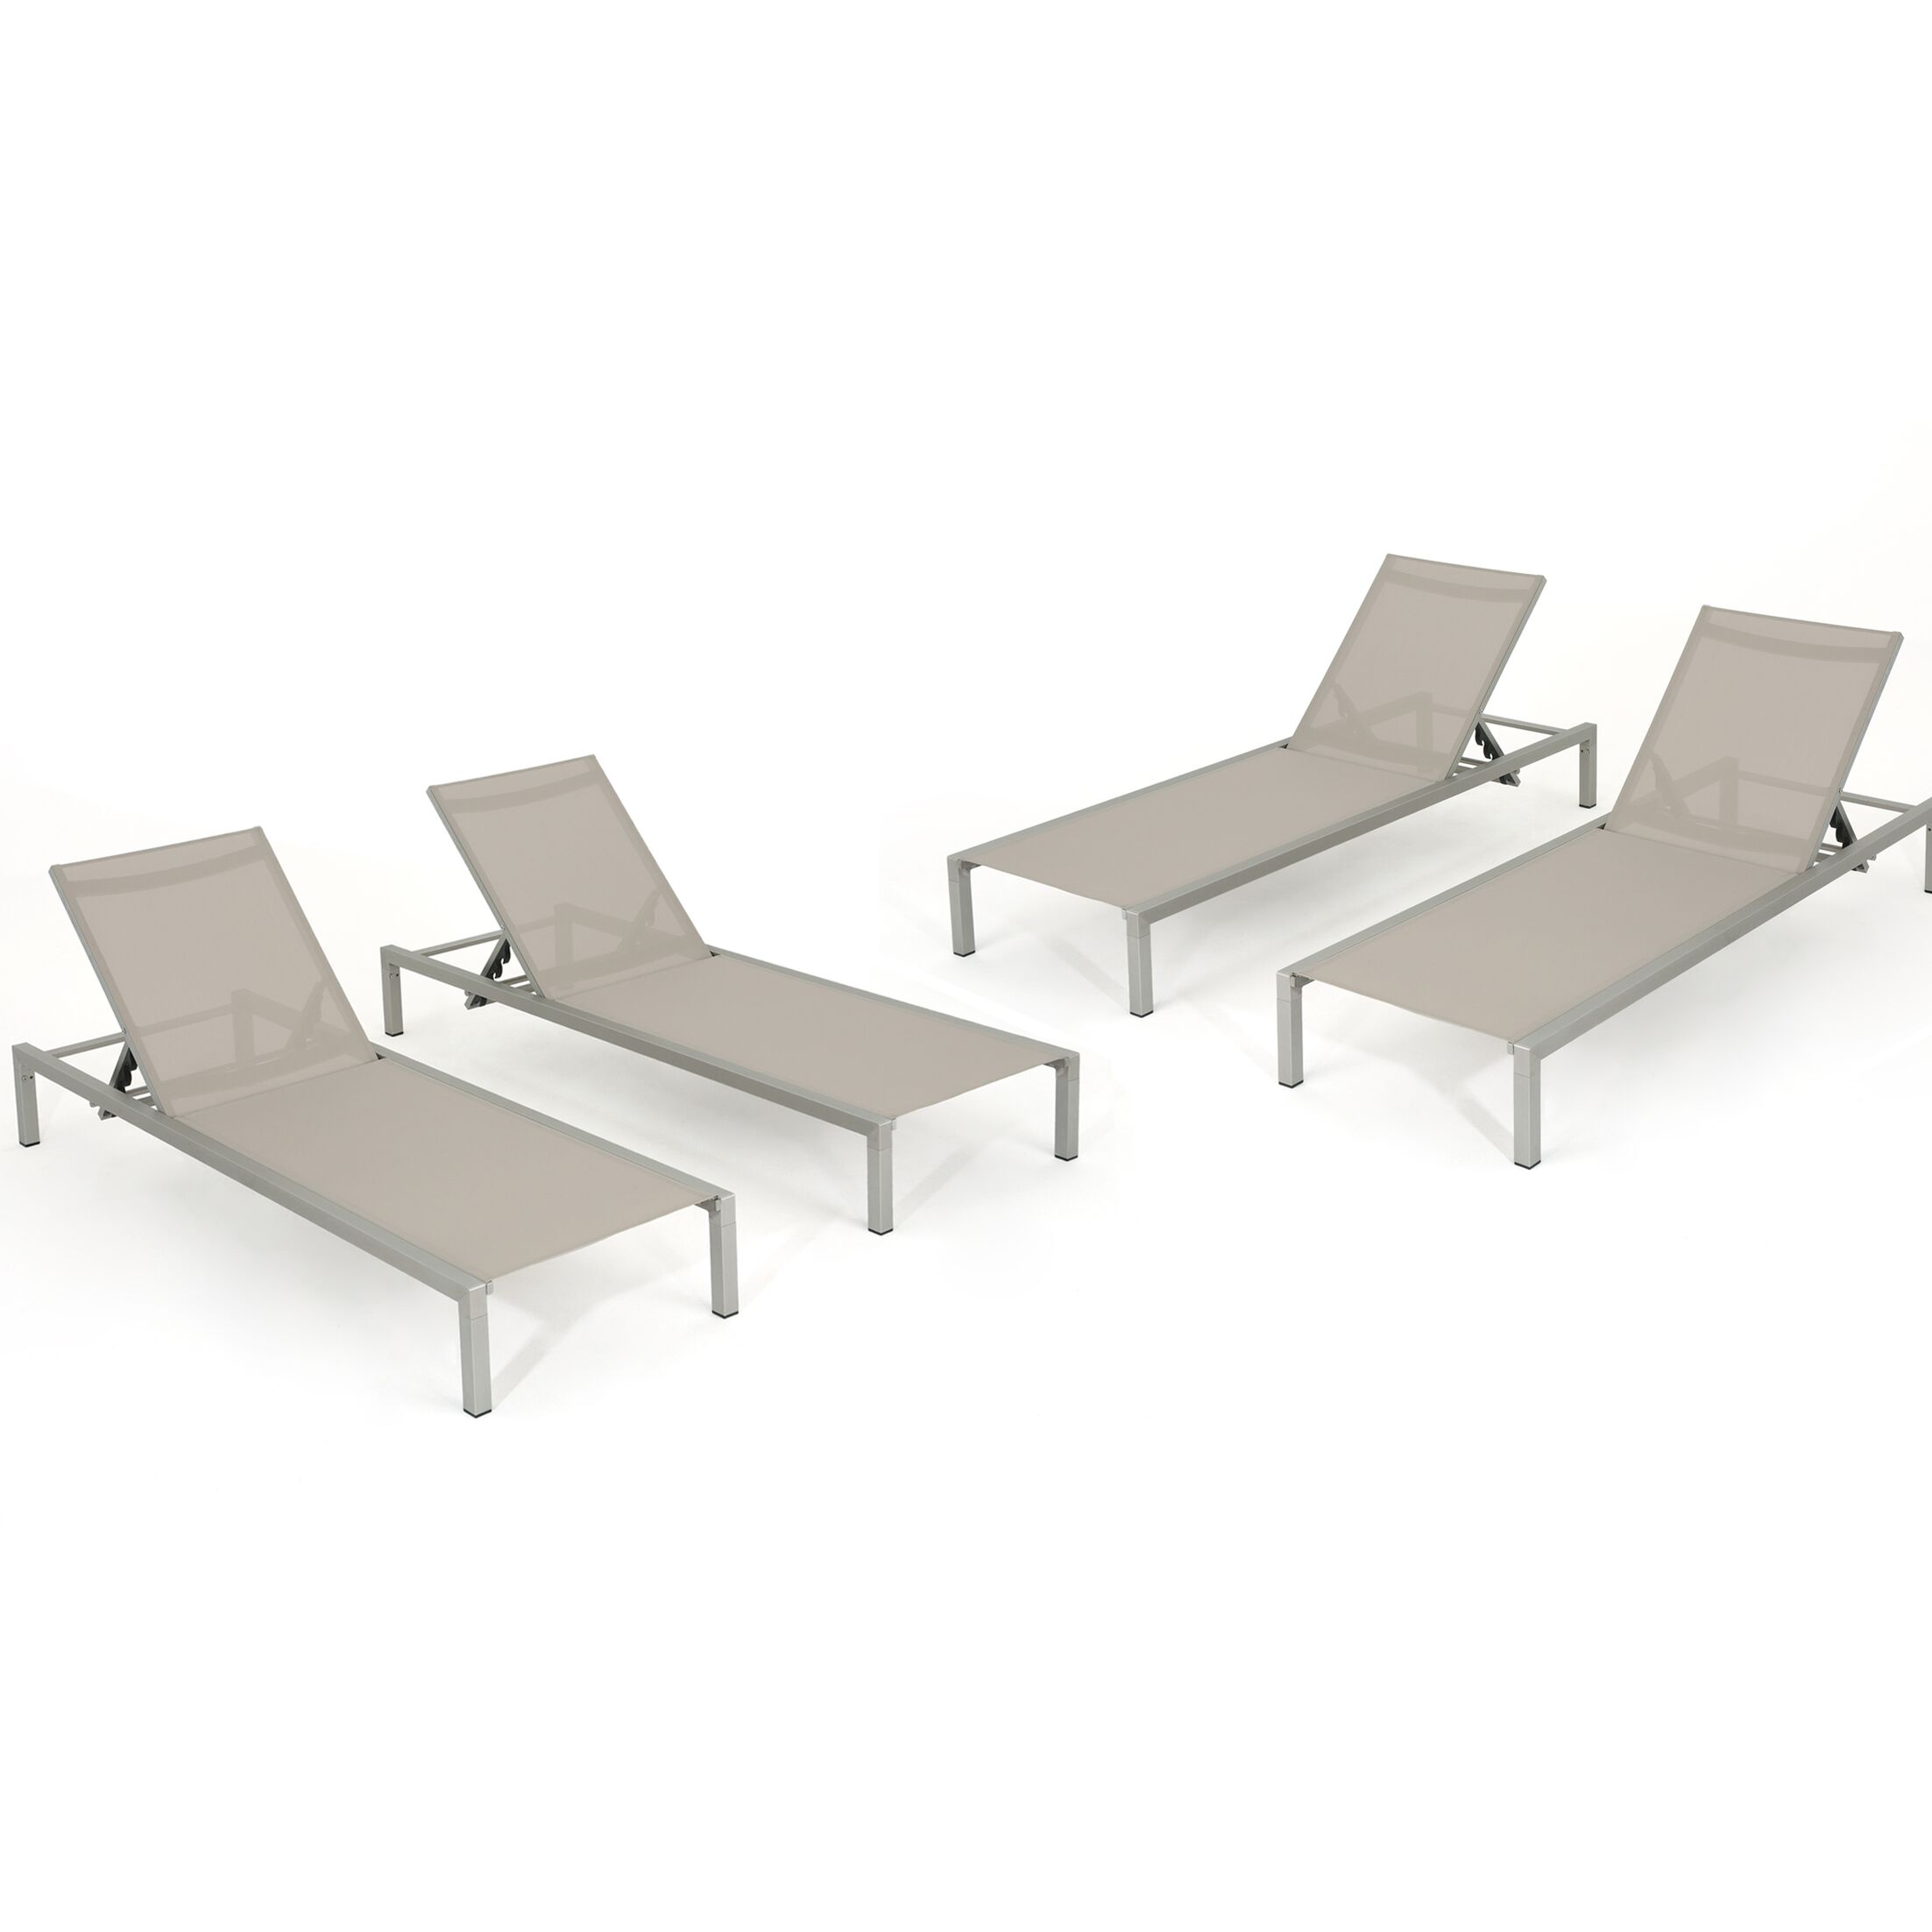 Sumfleth Reclining Chaise Lounge